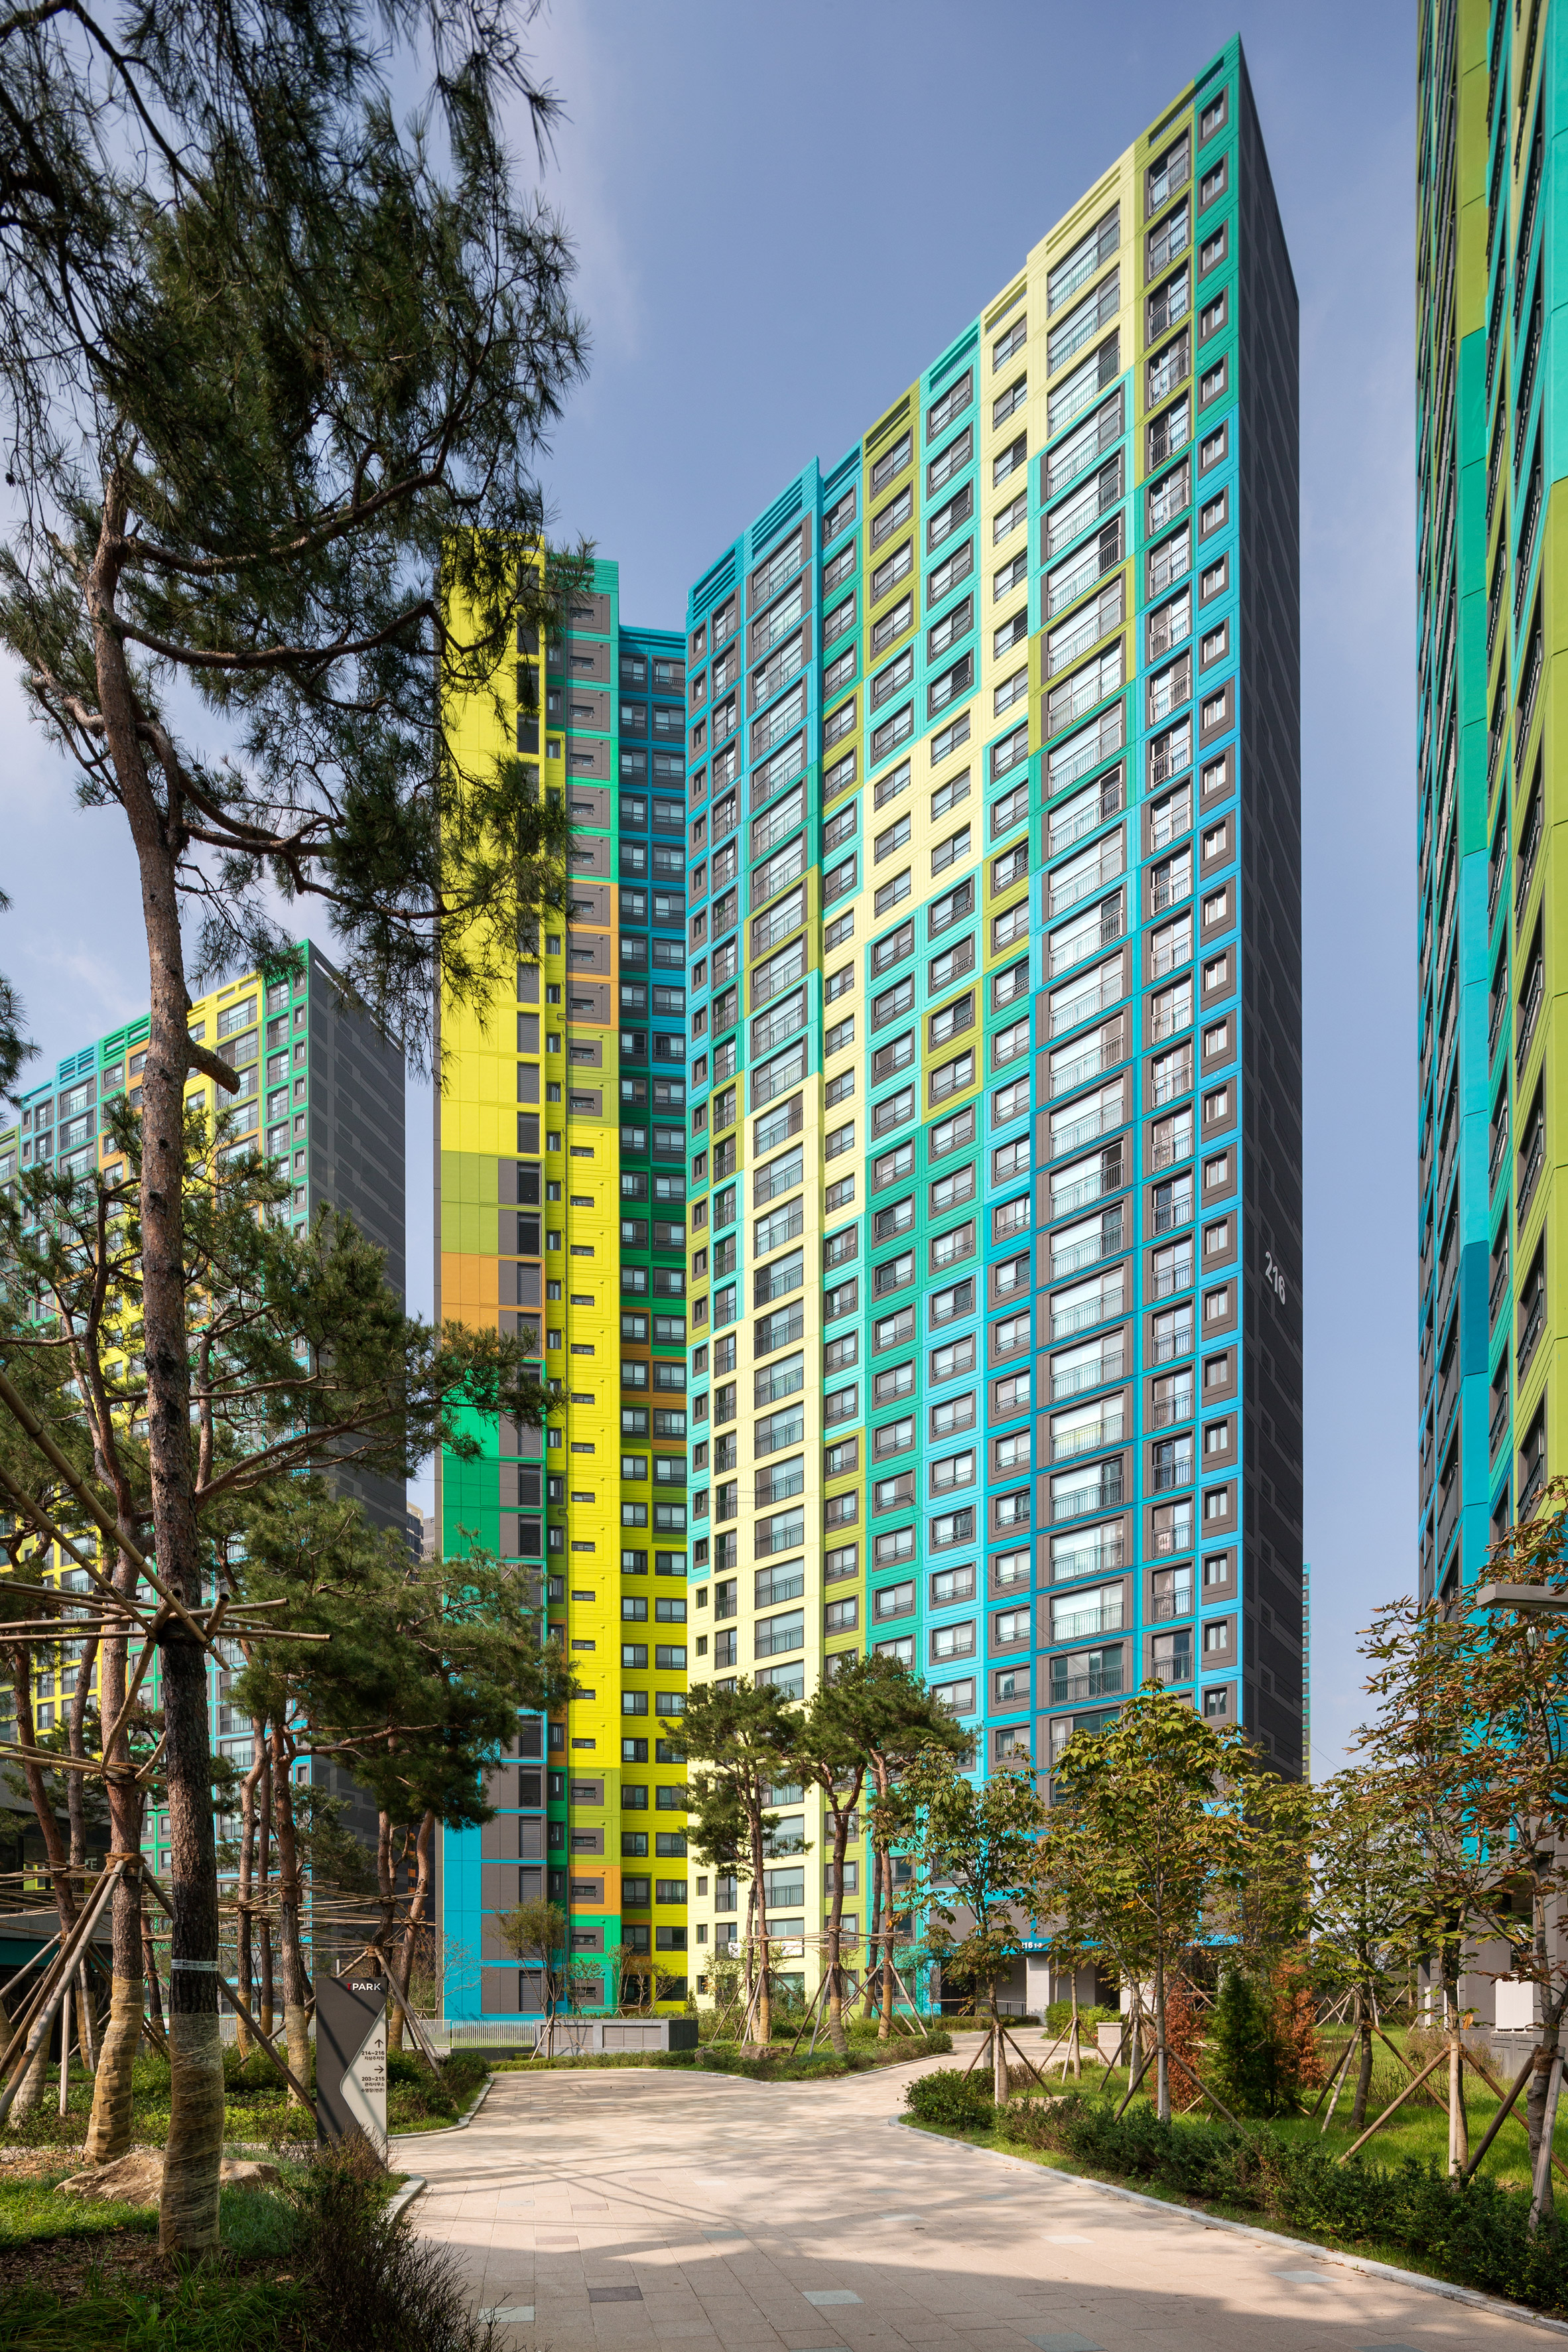 Colorful Blocks in South Korea